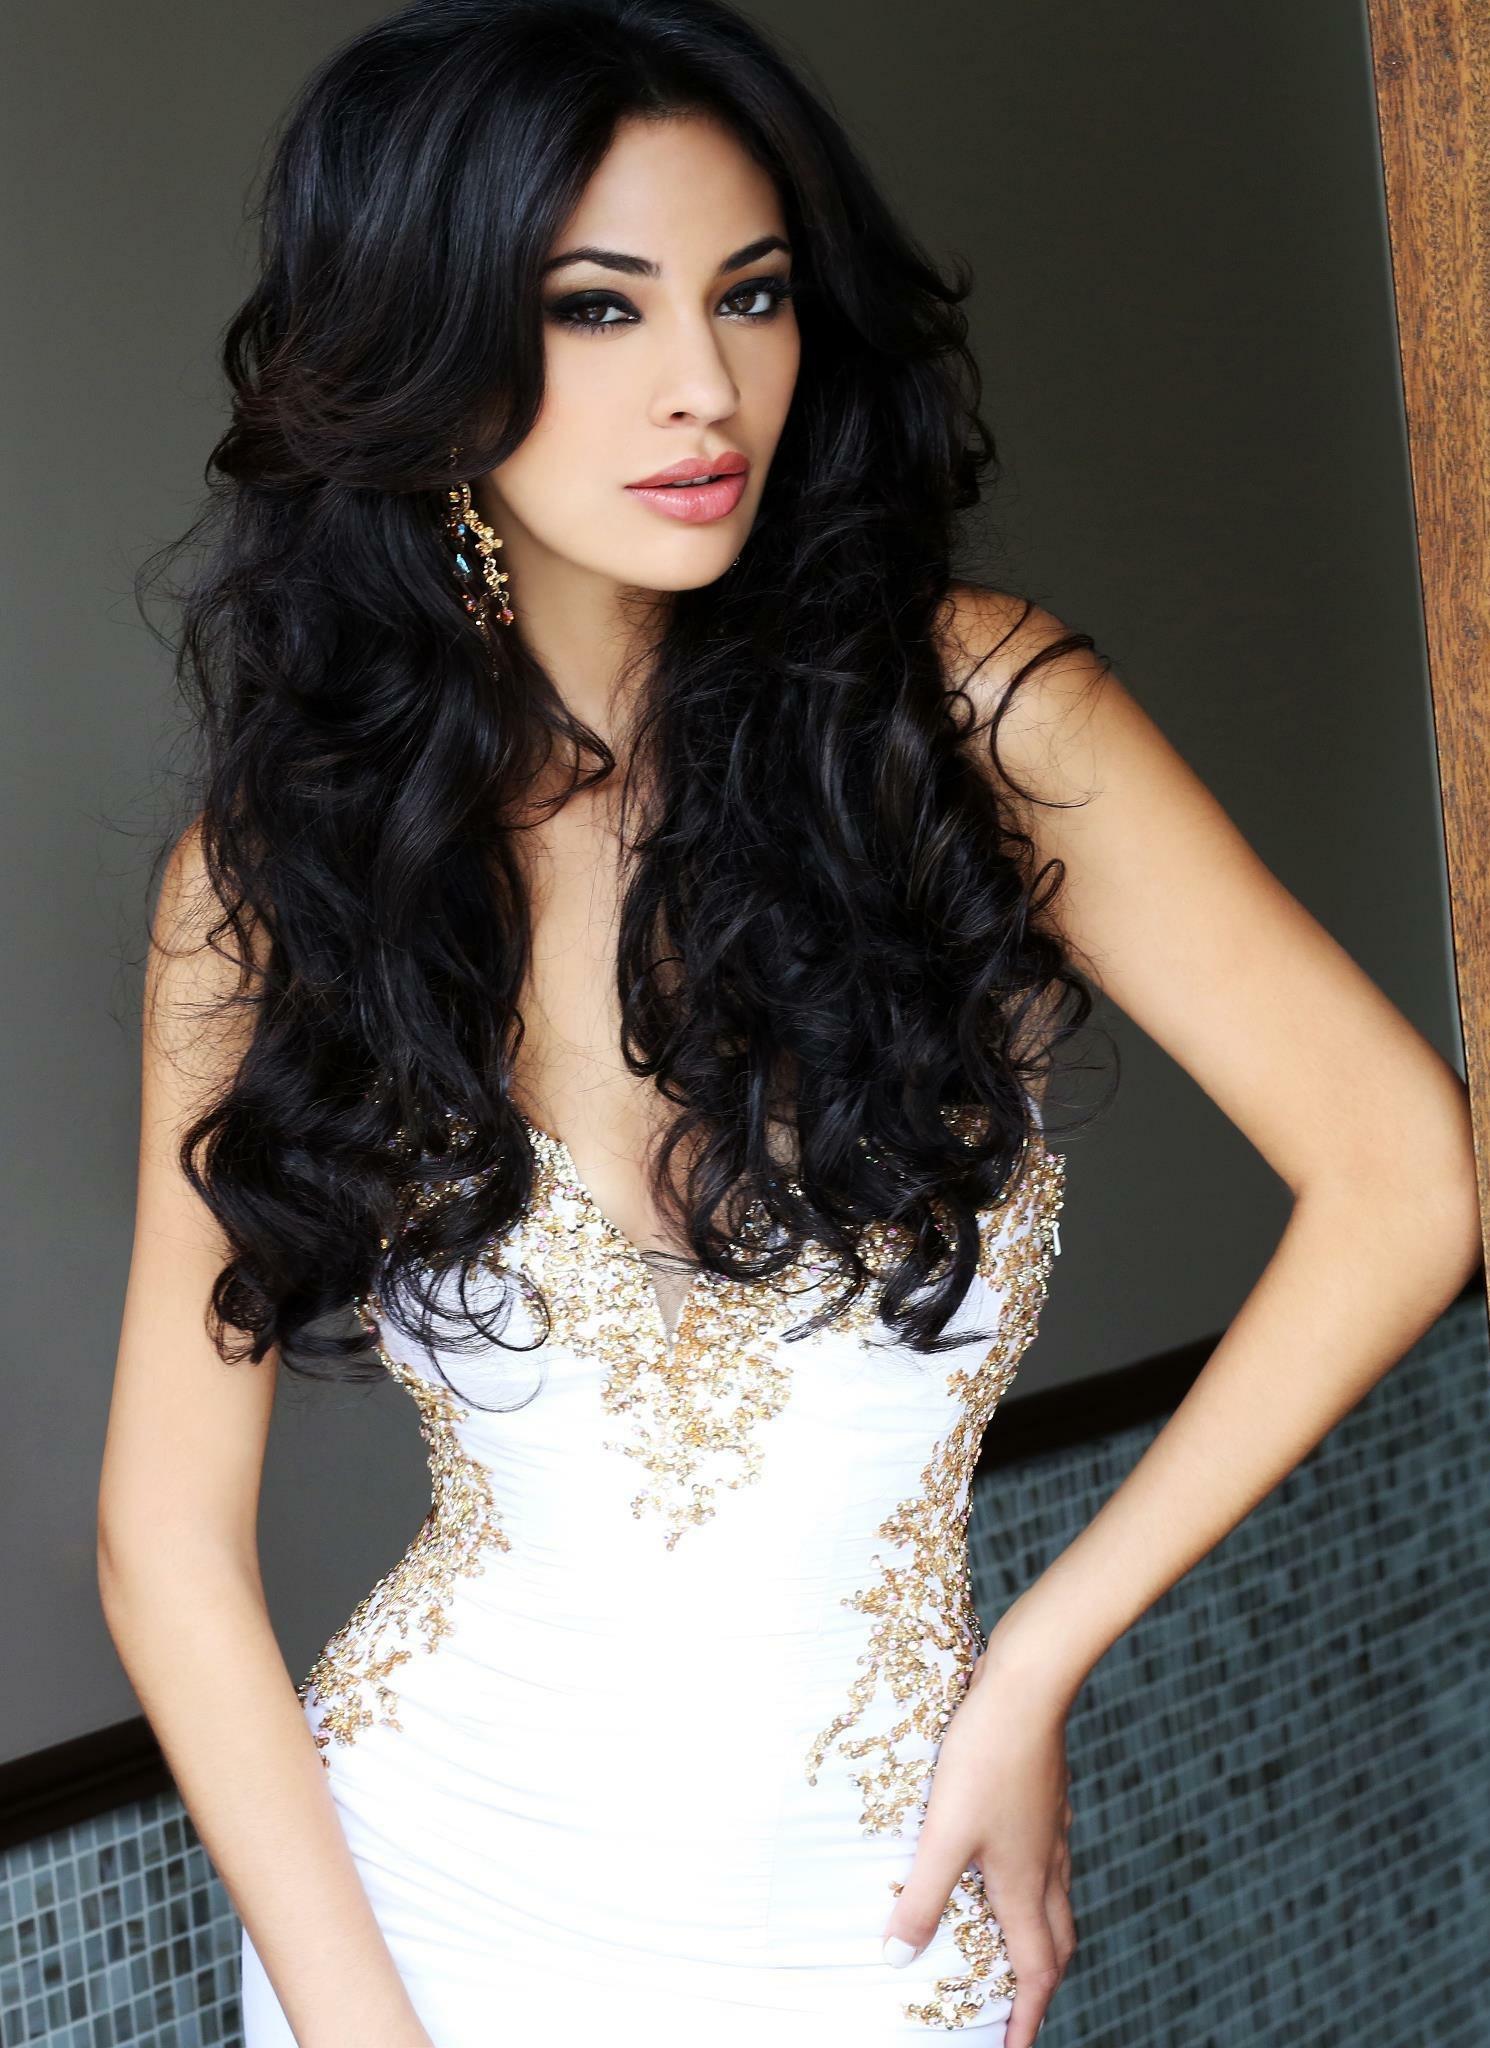 Alexandra Ahmadi